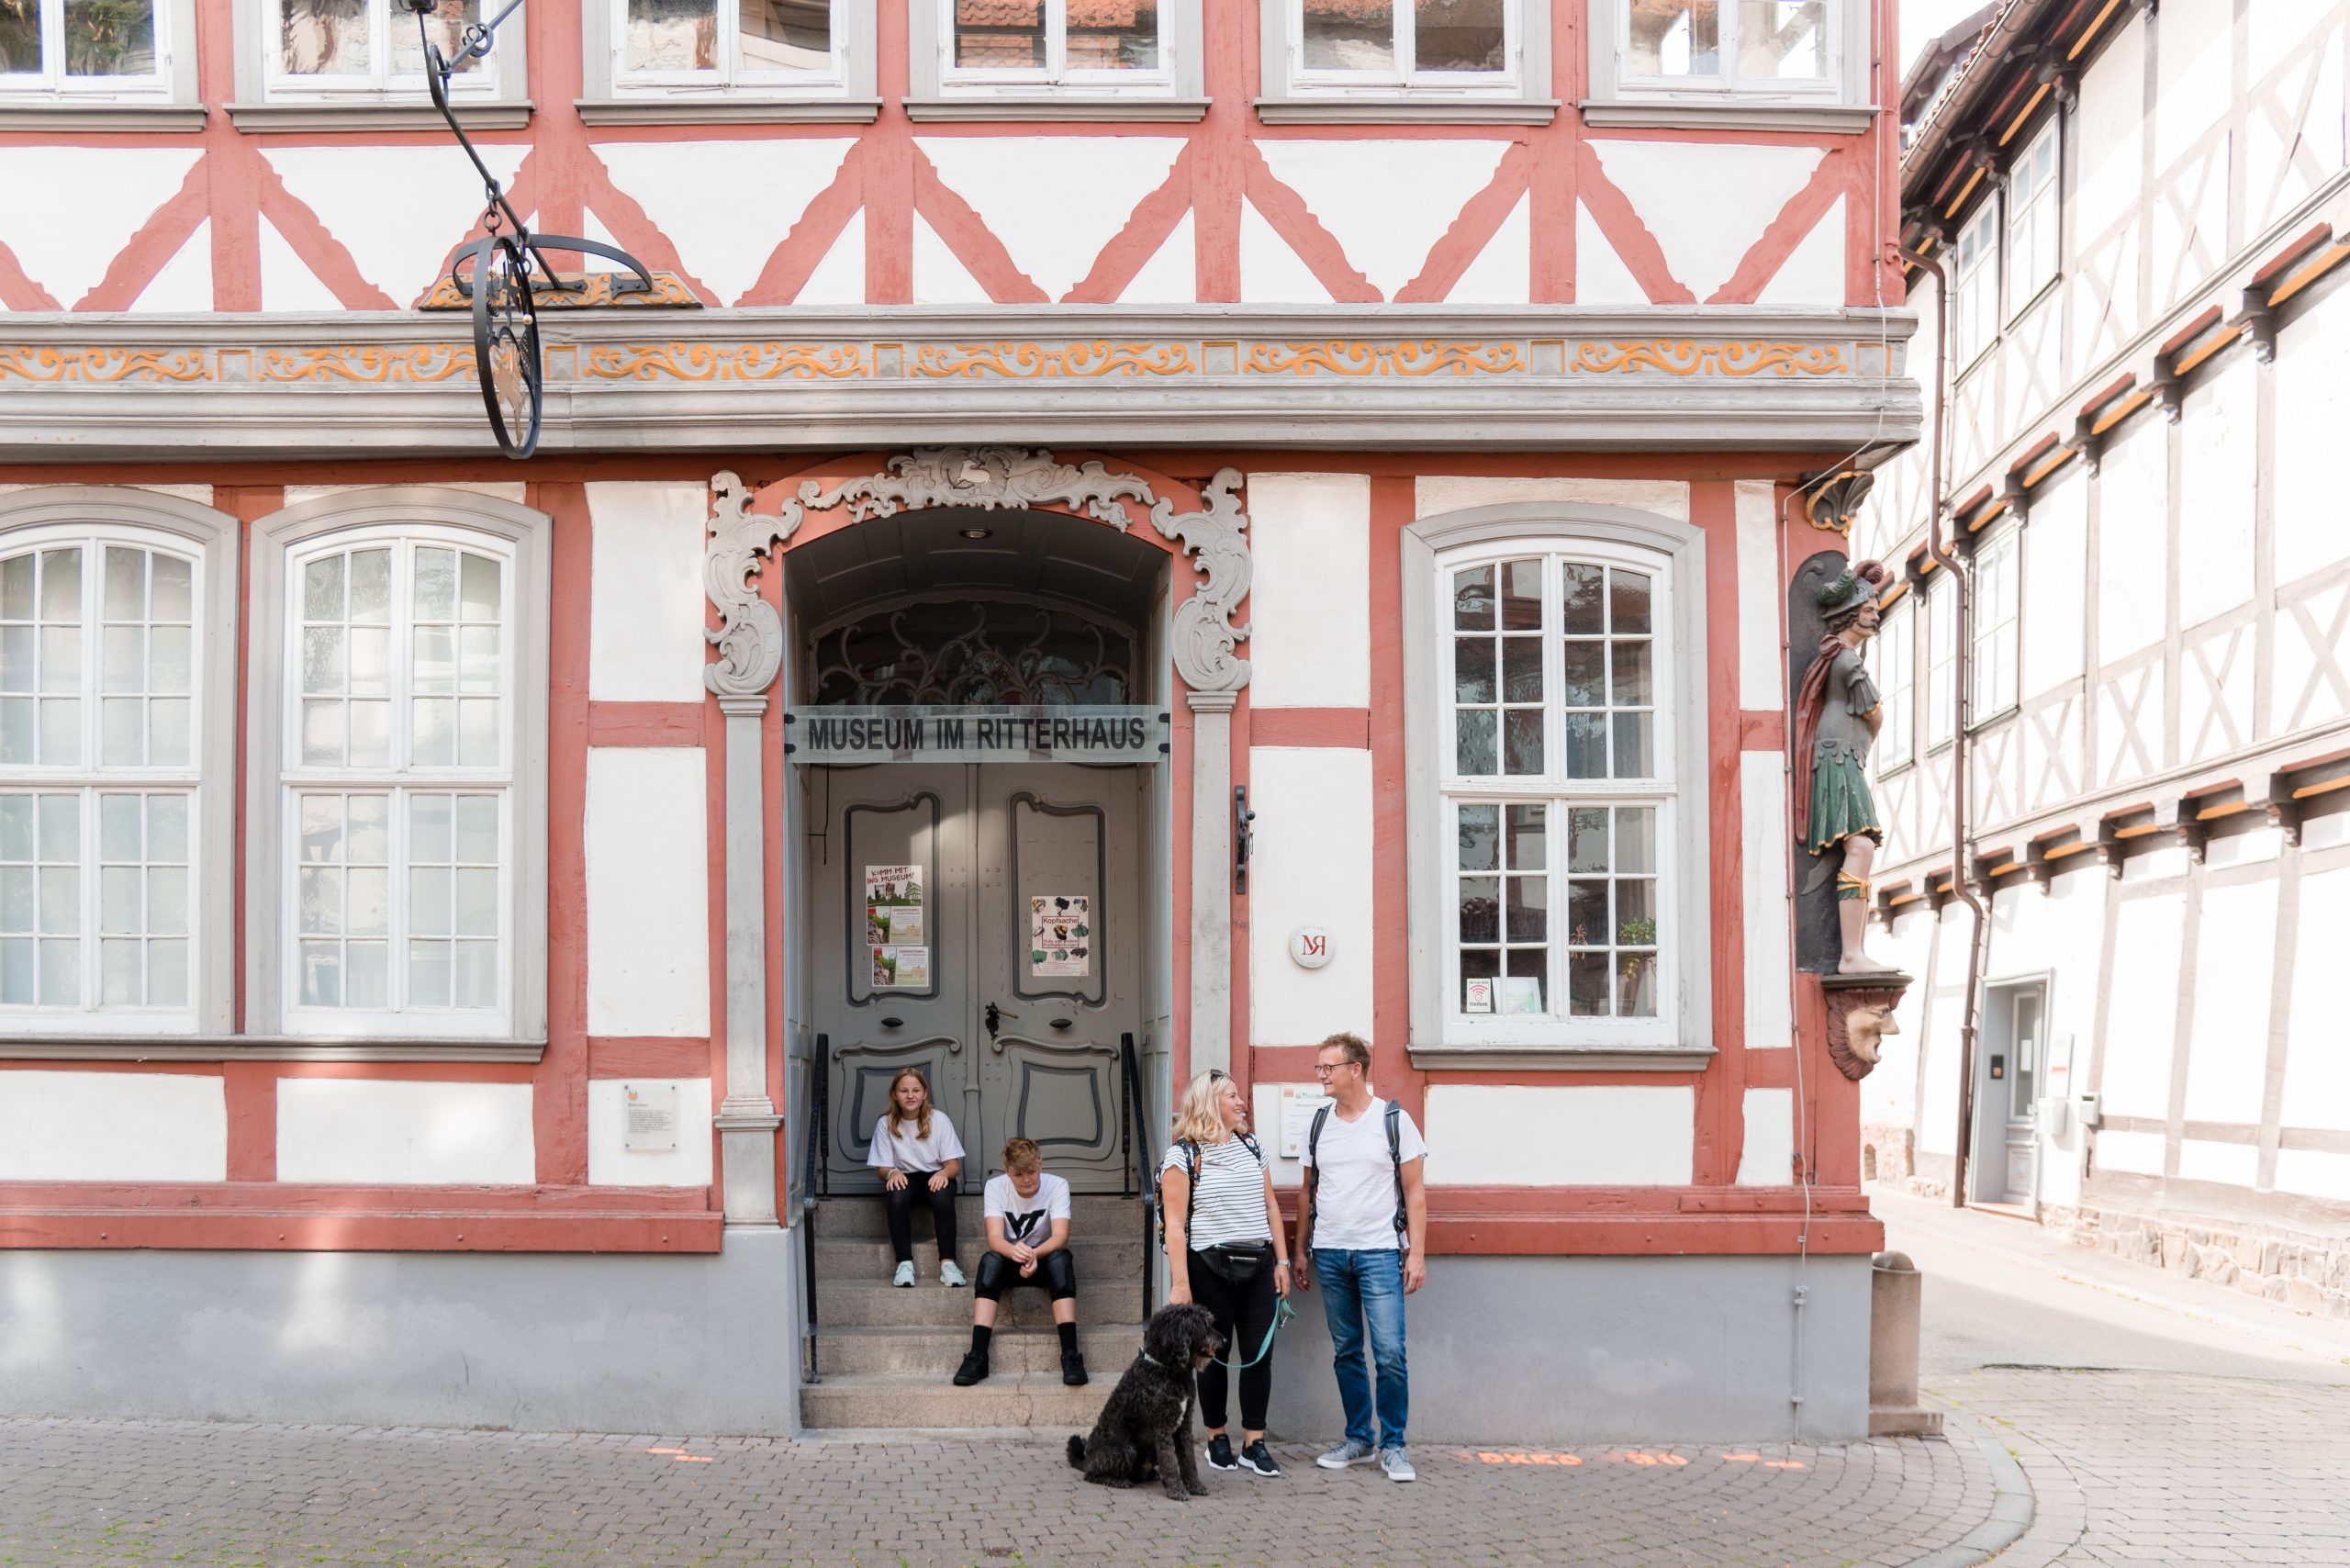 Museum im Ritterhaus in Osterode am Harz